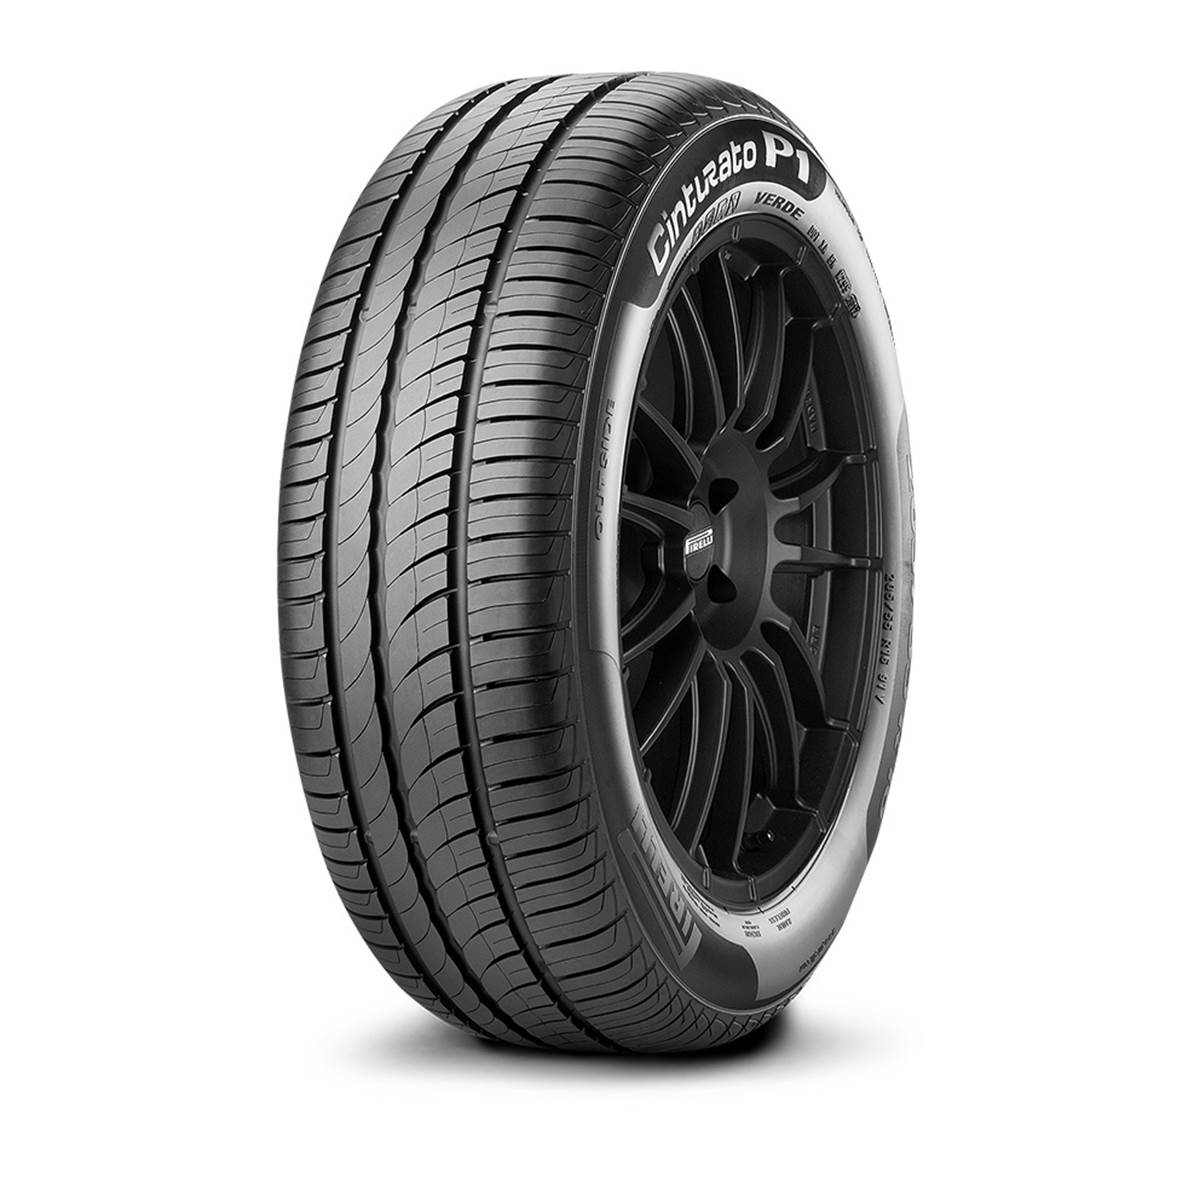 Pneu Pirelli 215/50R17 95V Cinturato P1 XL